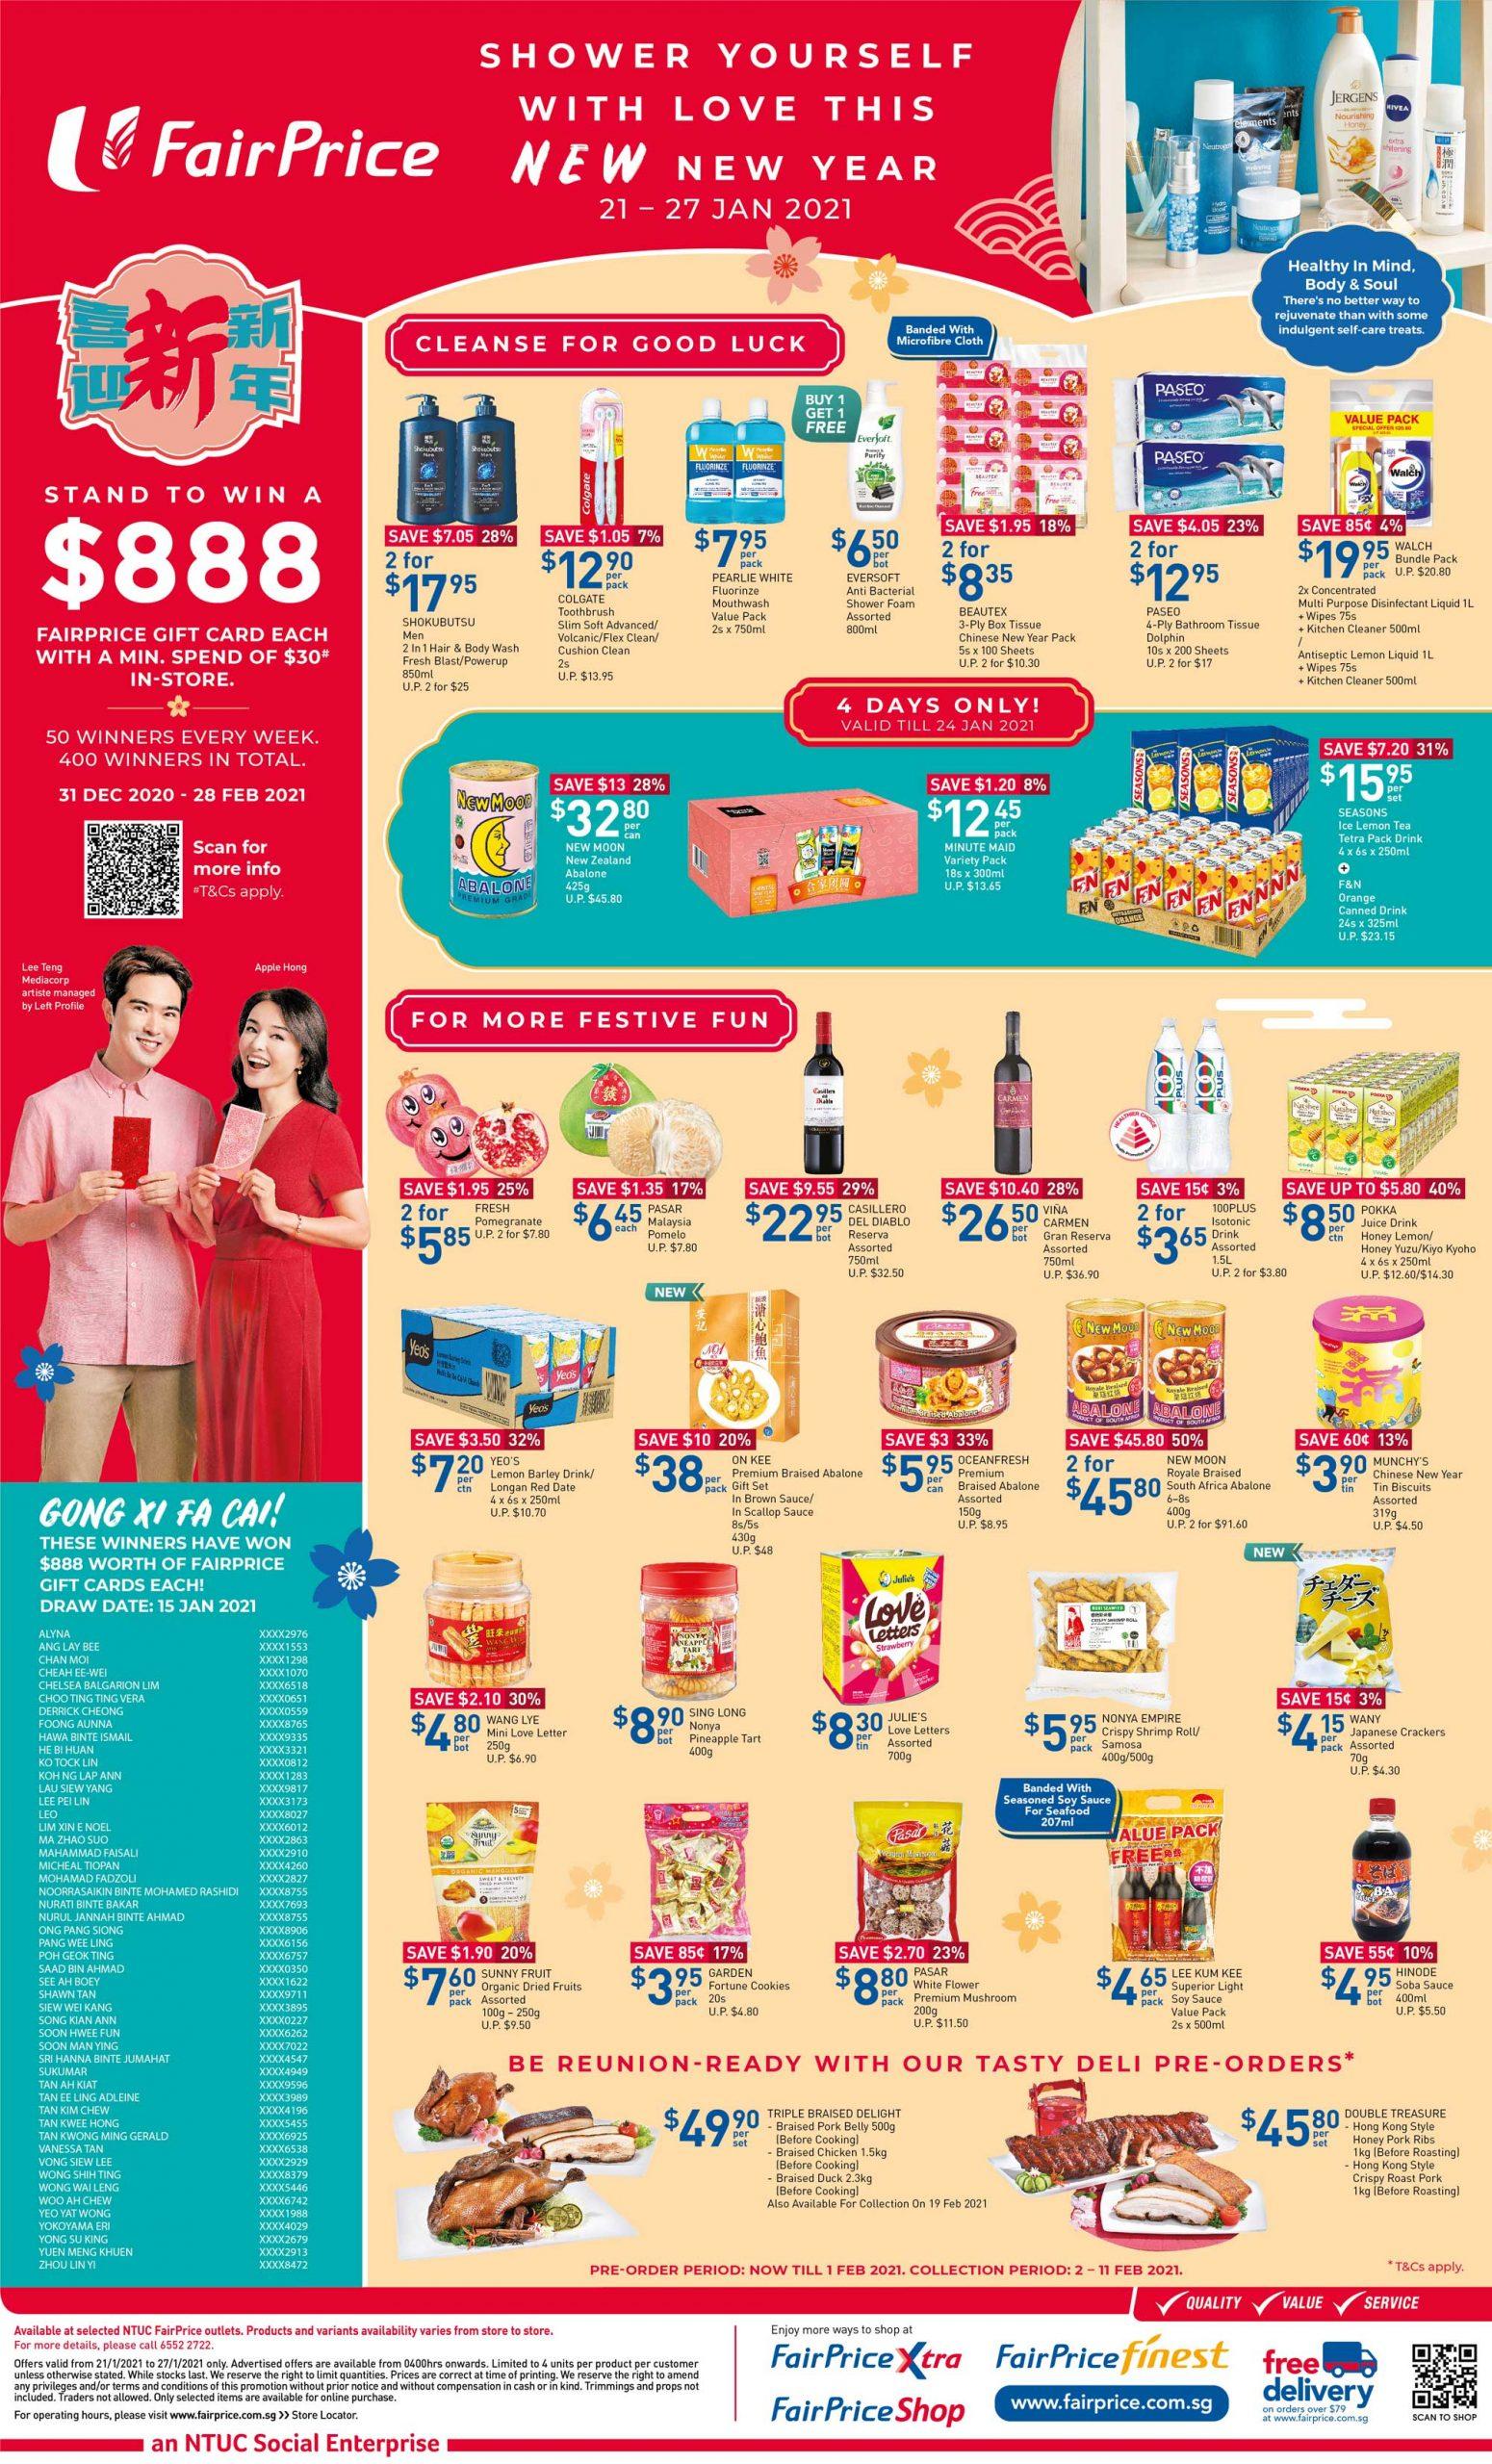 CNY prosperity products for everyone till 27 January 2021